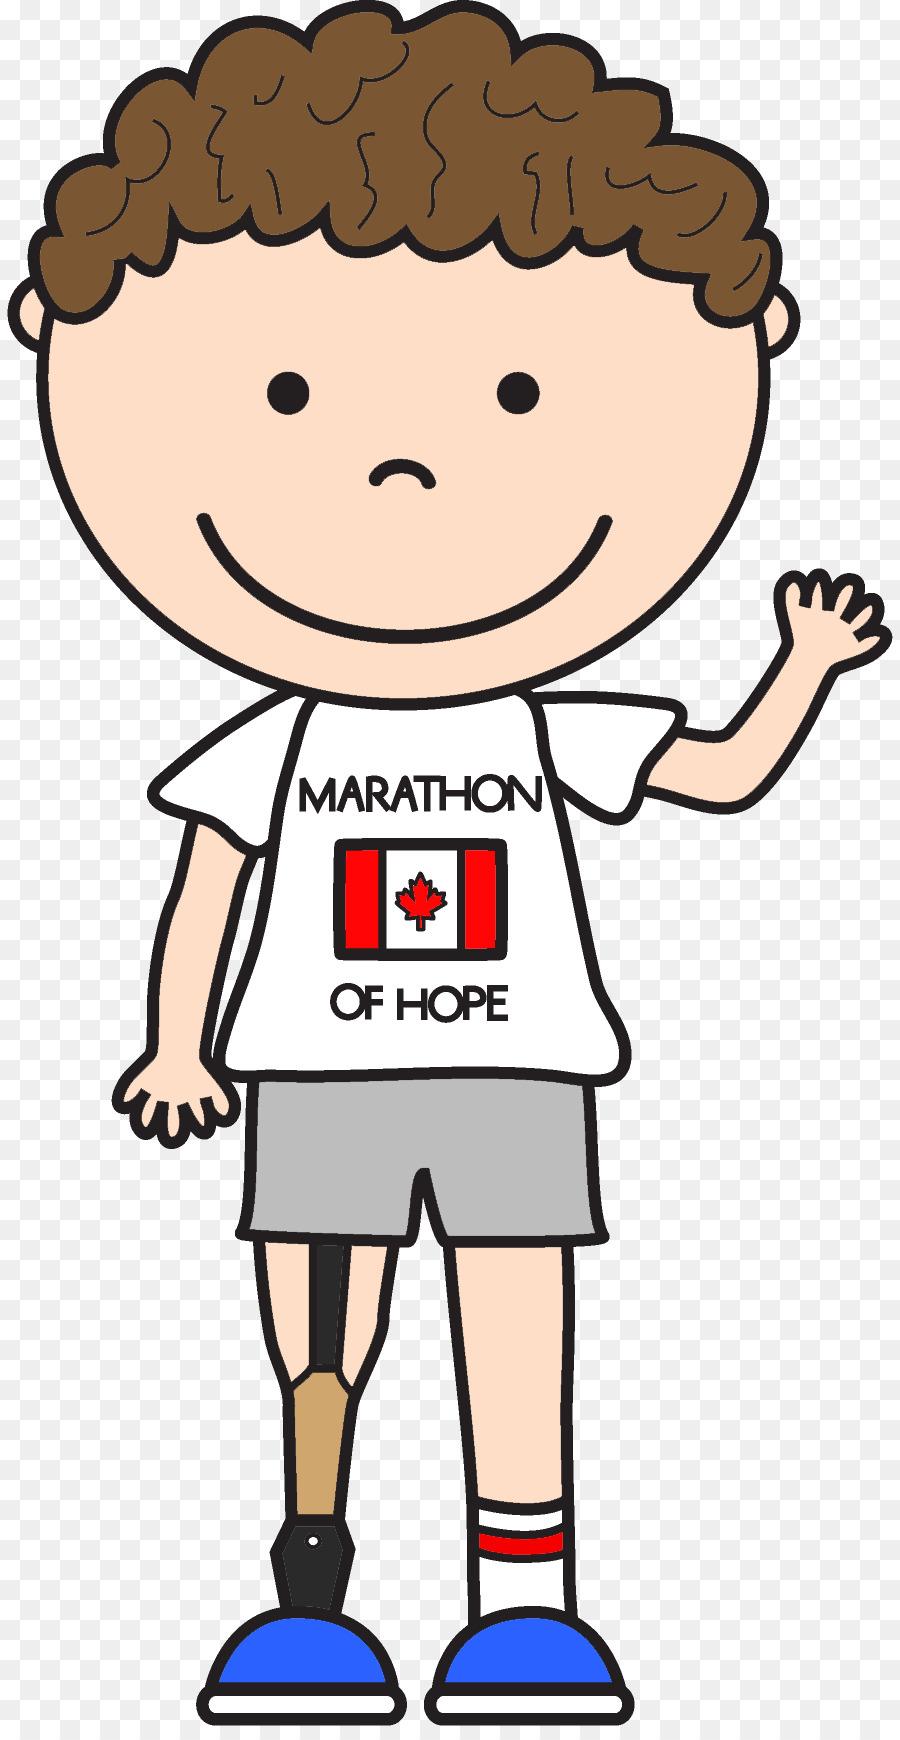 900x1740 Terry Fox Run Le Marathon De L'Espoir Child Clip Art